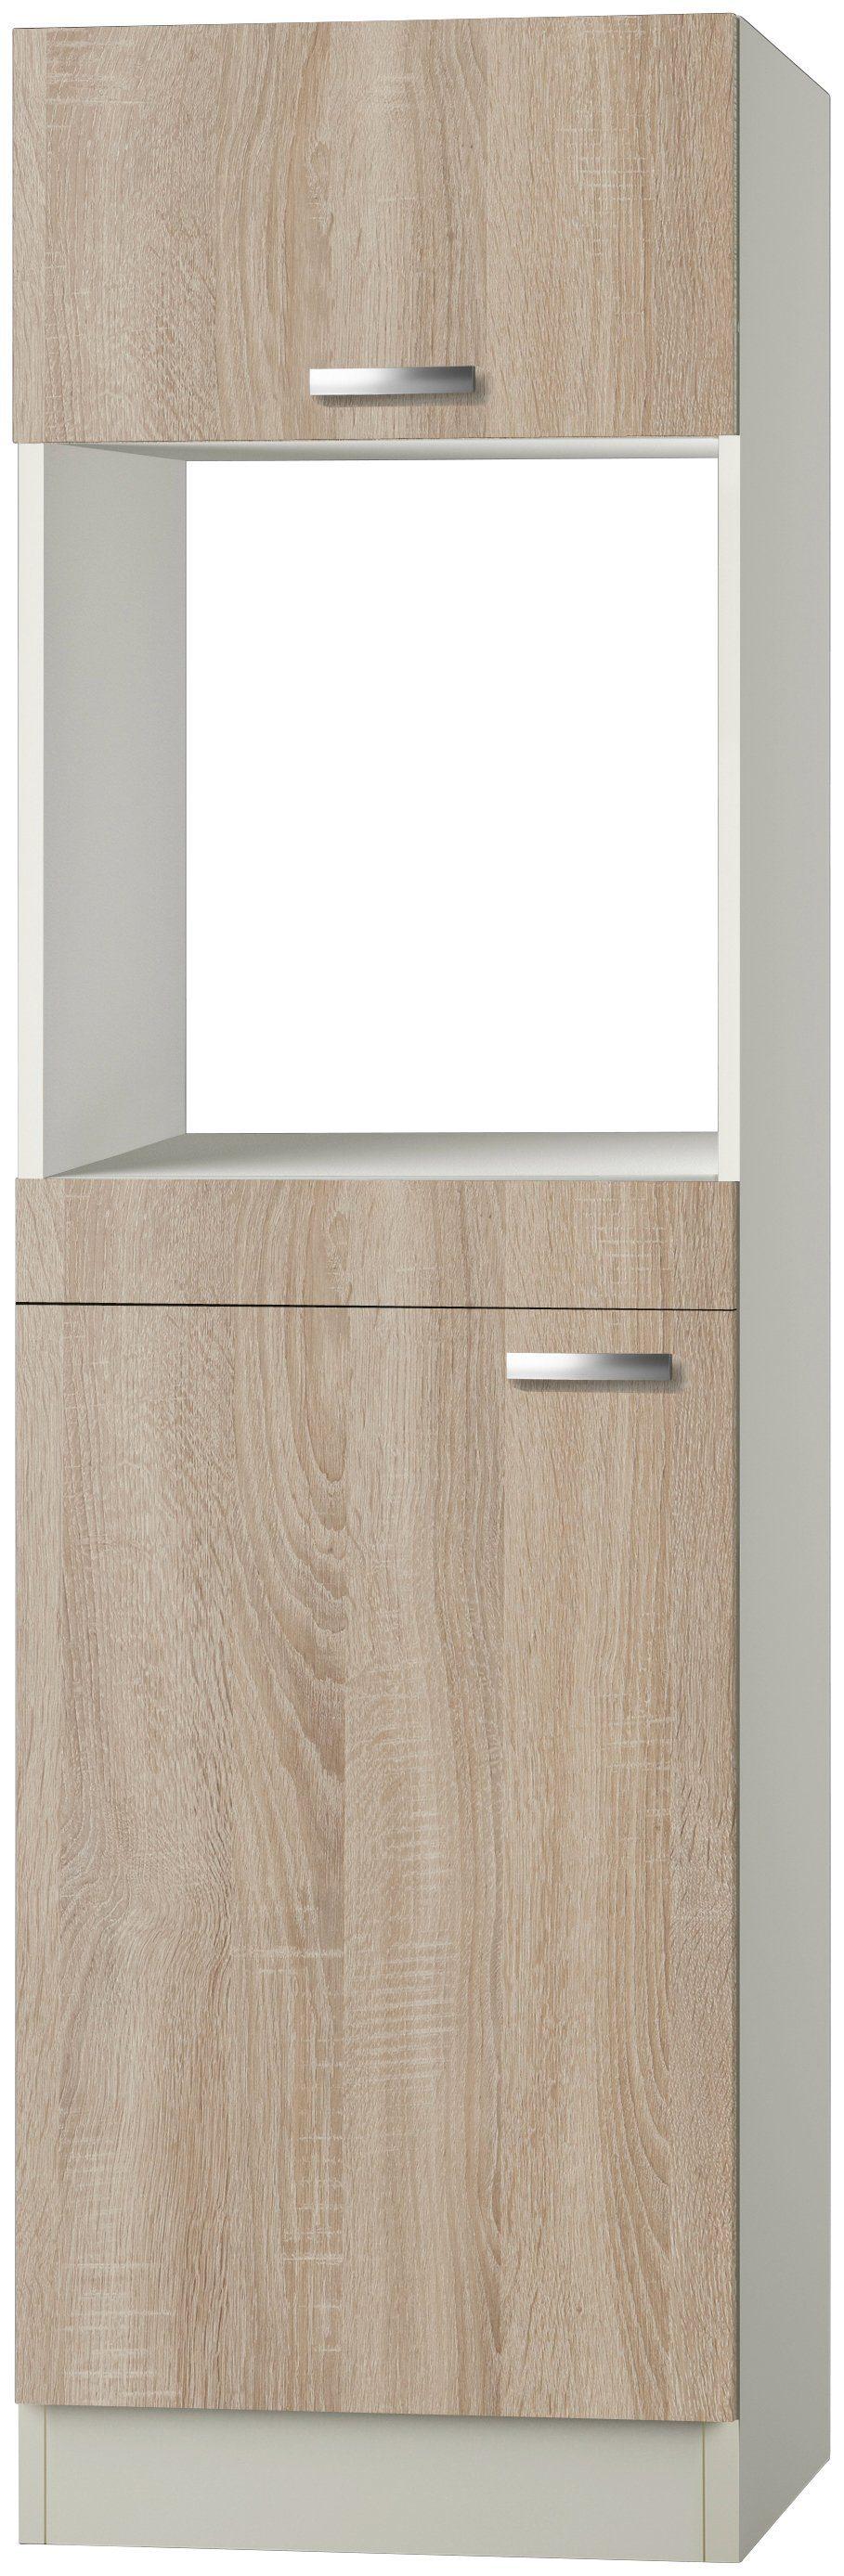 Kombinierter Backofen-Kühlumbauschrank »Padua, Höhe 206,8 cm«